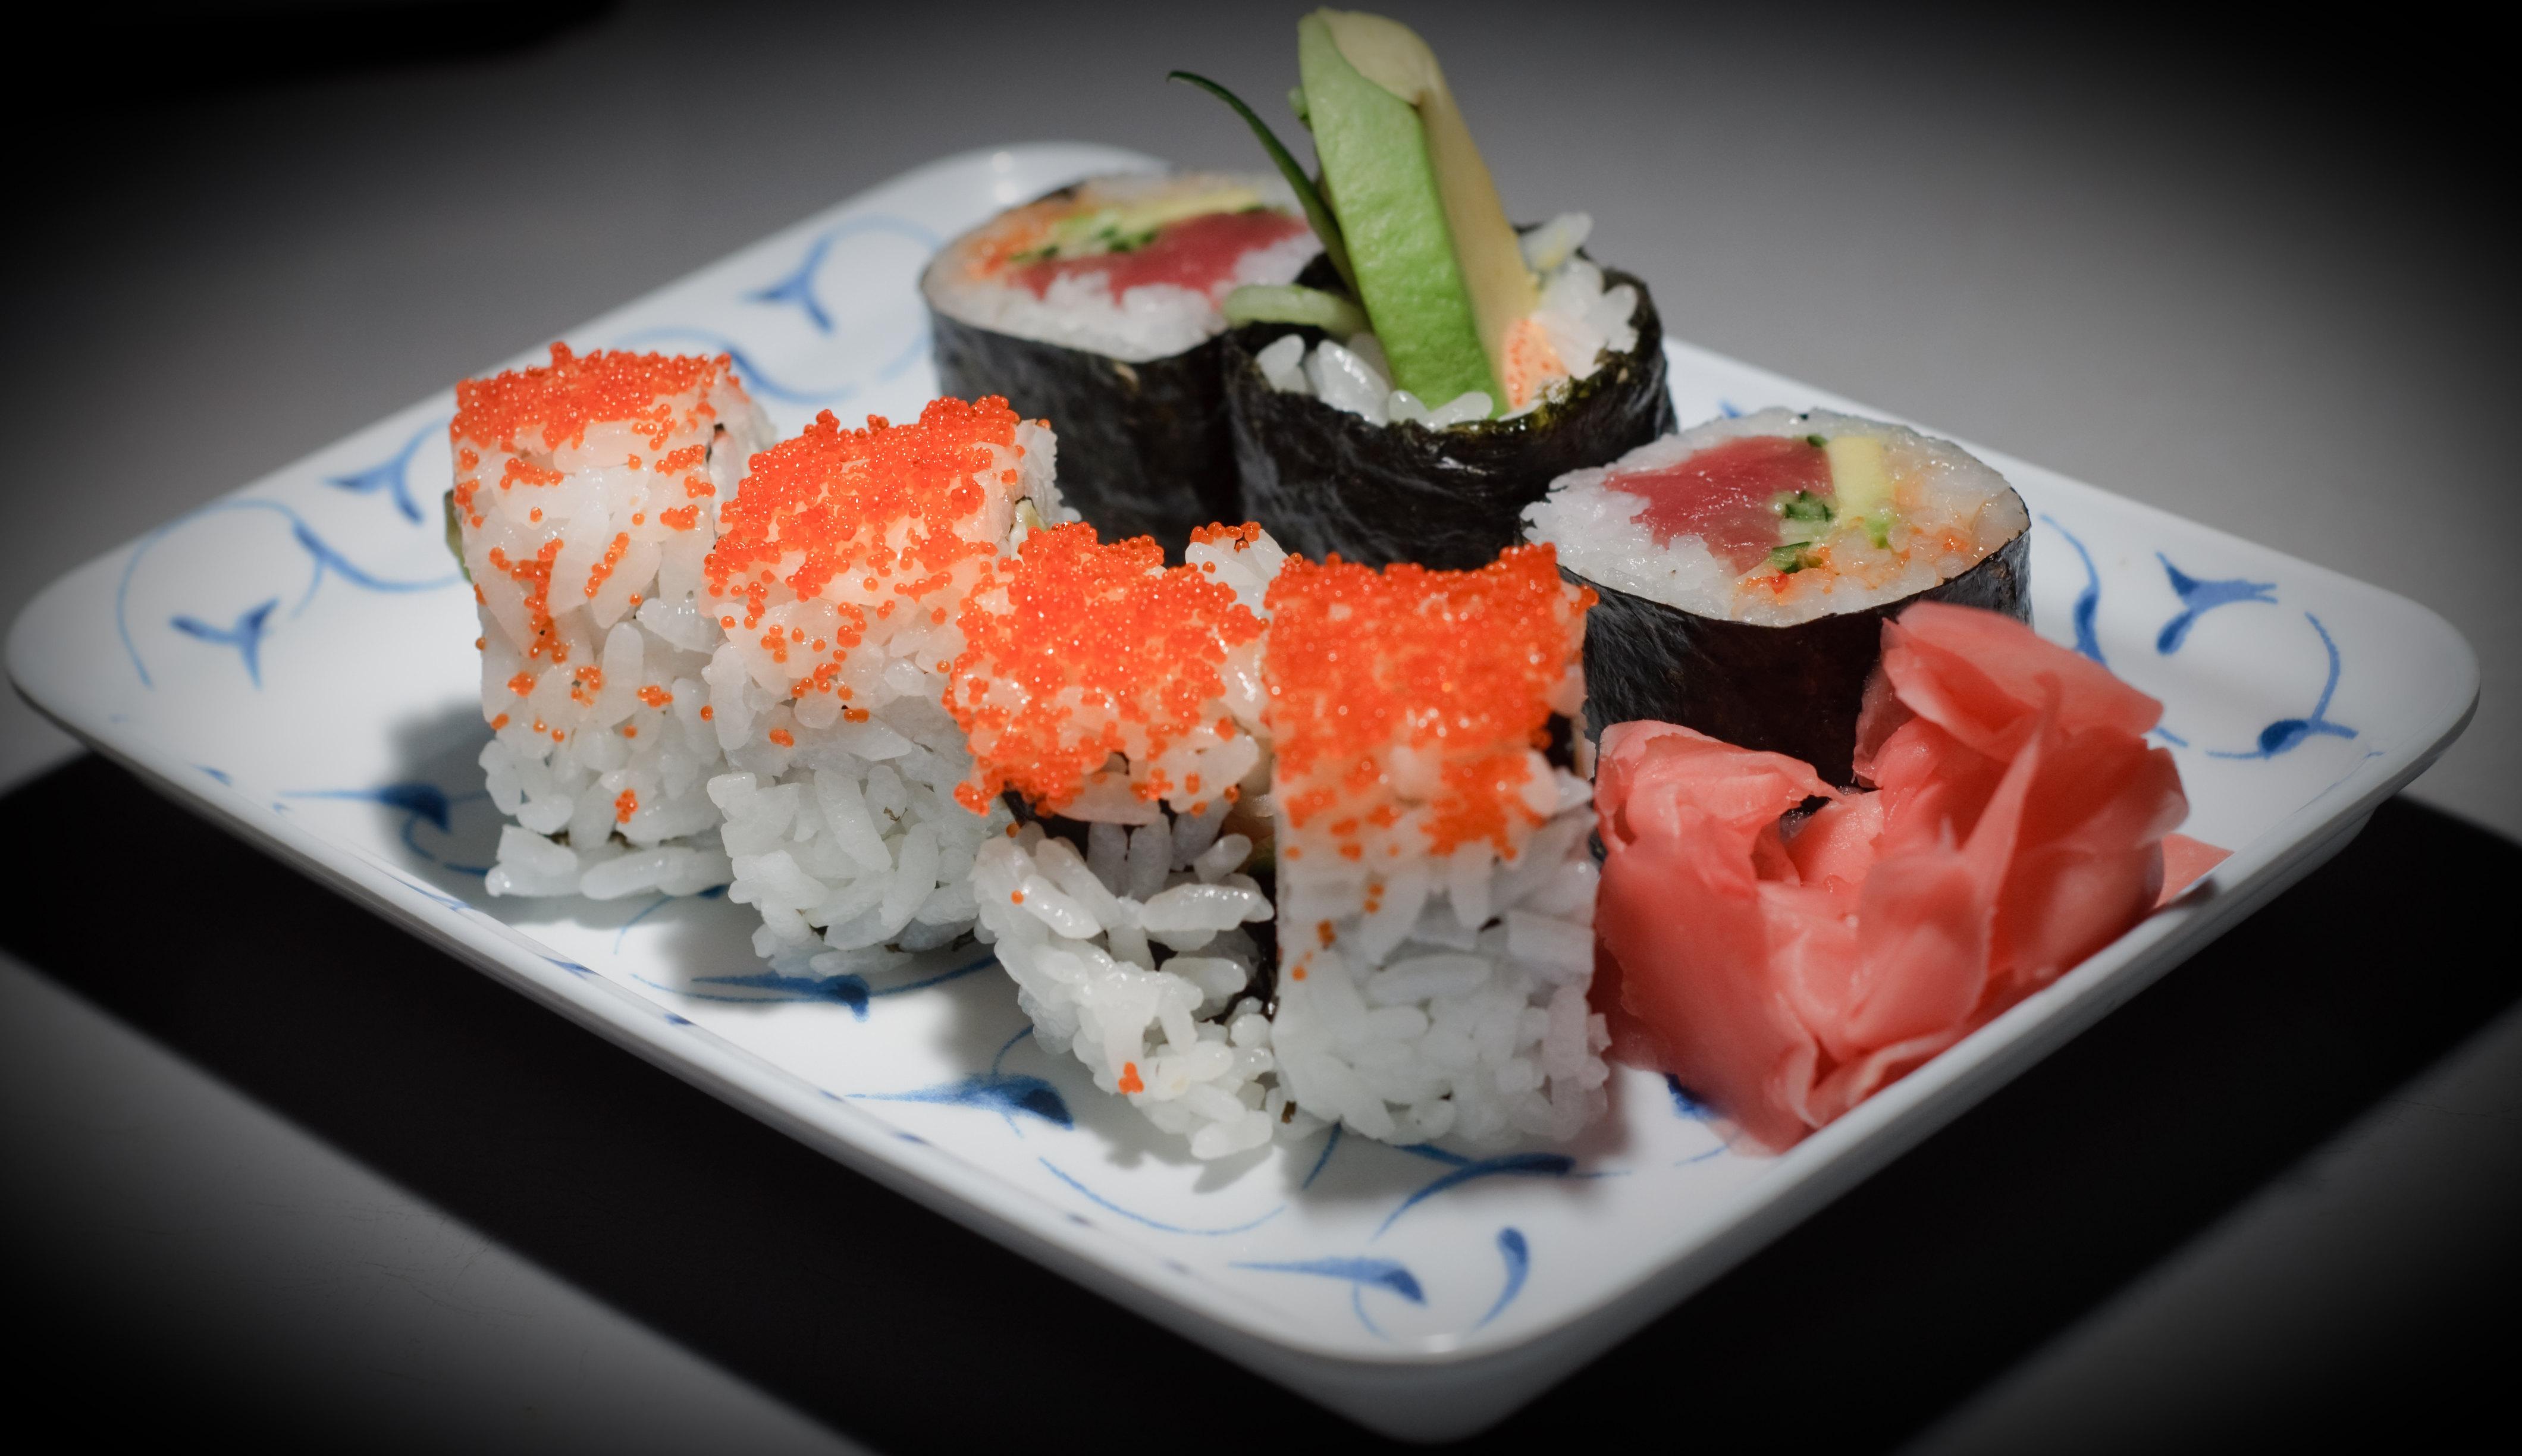 File:Grandma's birthday - sushi on rectangular plate.jpg - Wikimedia ...